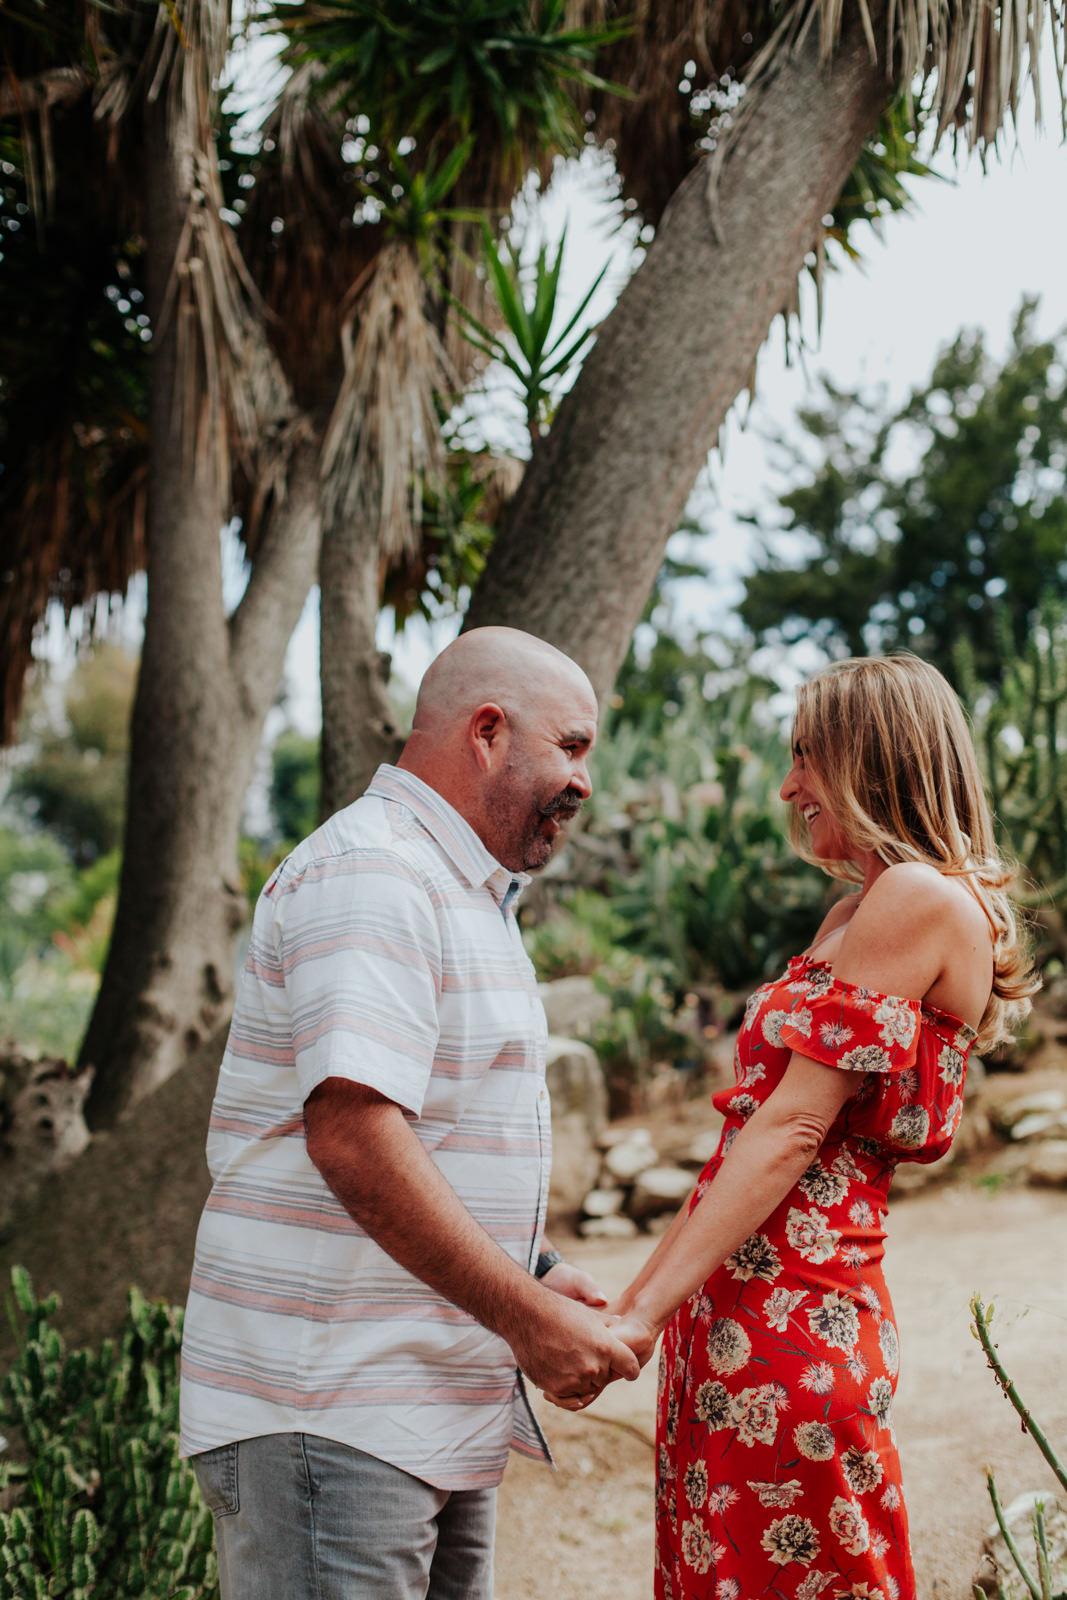 terranea-resort-palos-verdes-california-wedding-photography-cove-los-angeles-pierce-17 copia.jpg